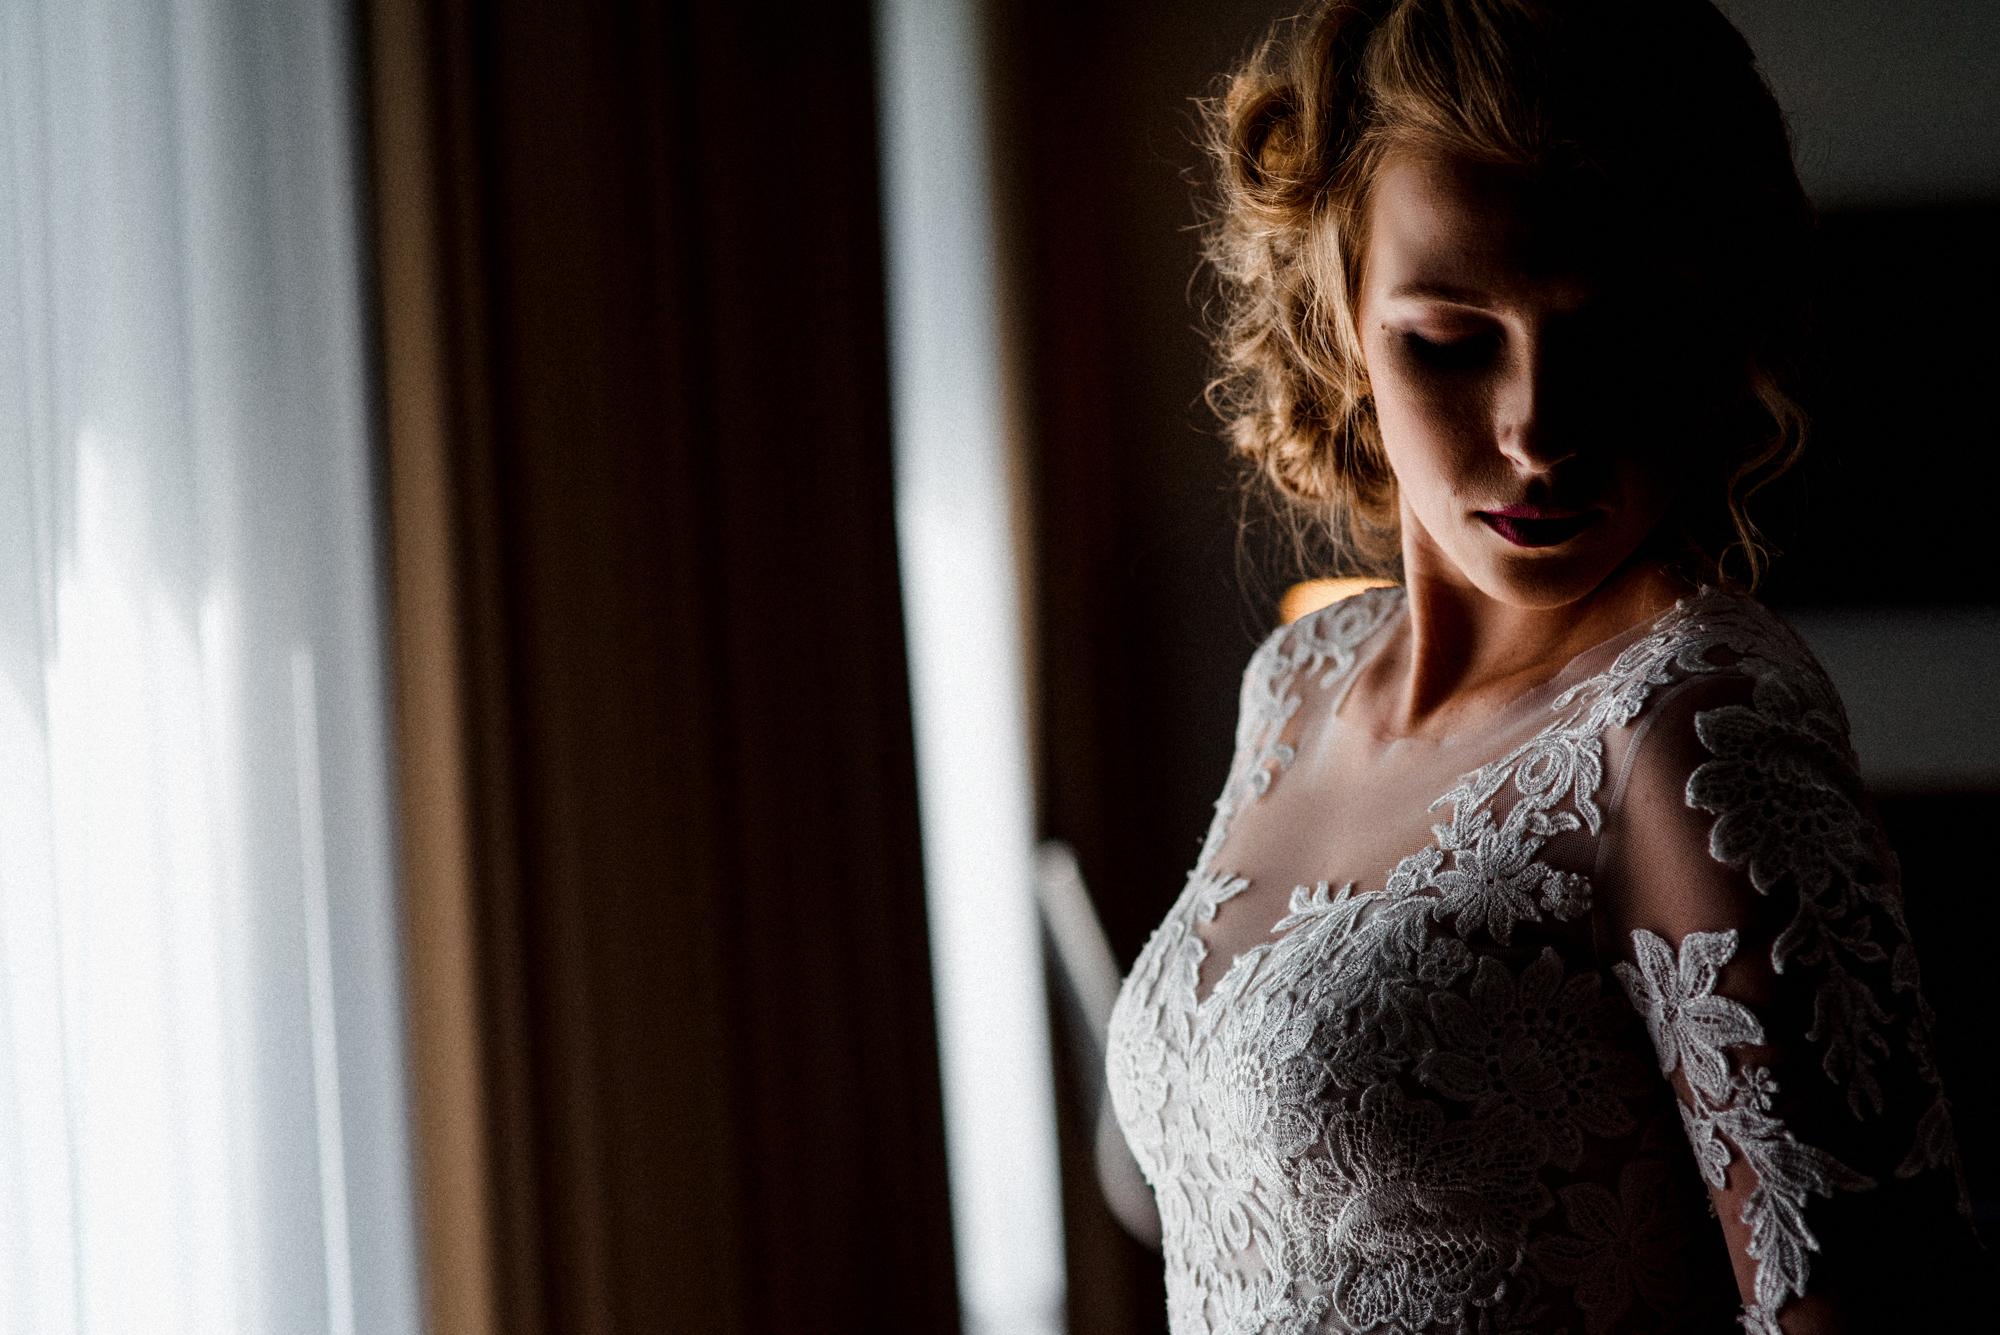 Sesja_Slubna_Hotel_Heron_0025 - Kopia